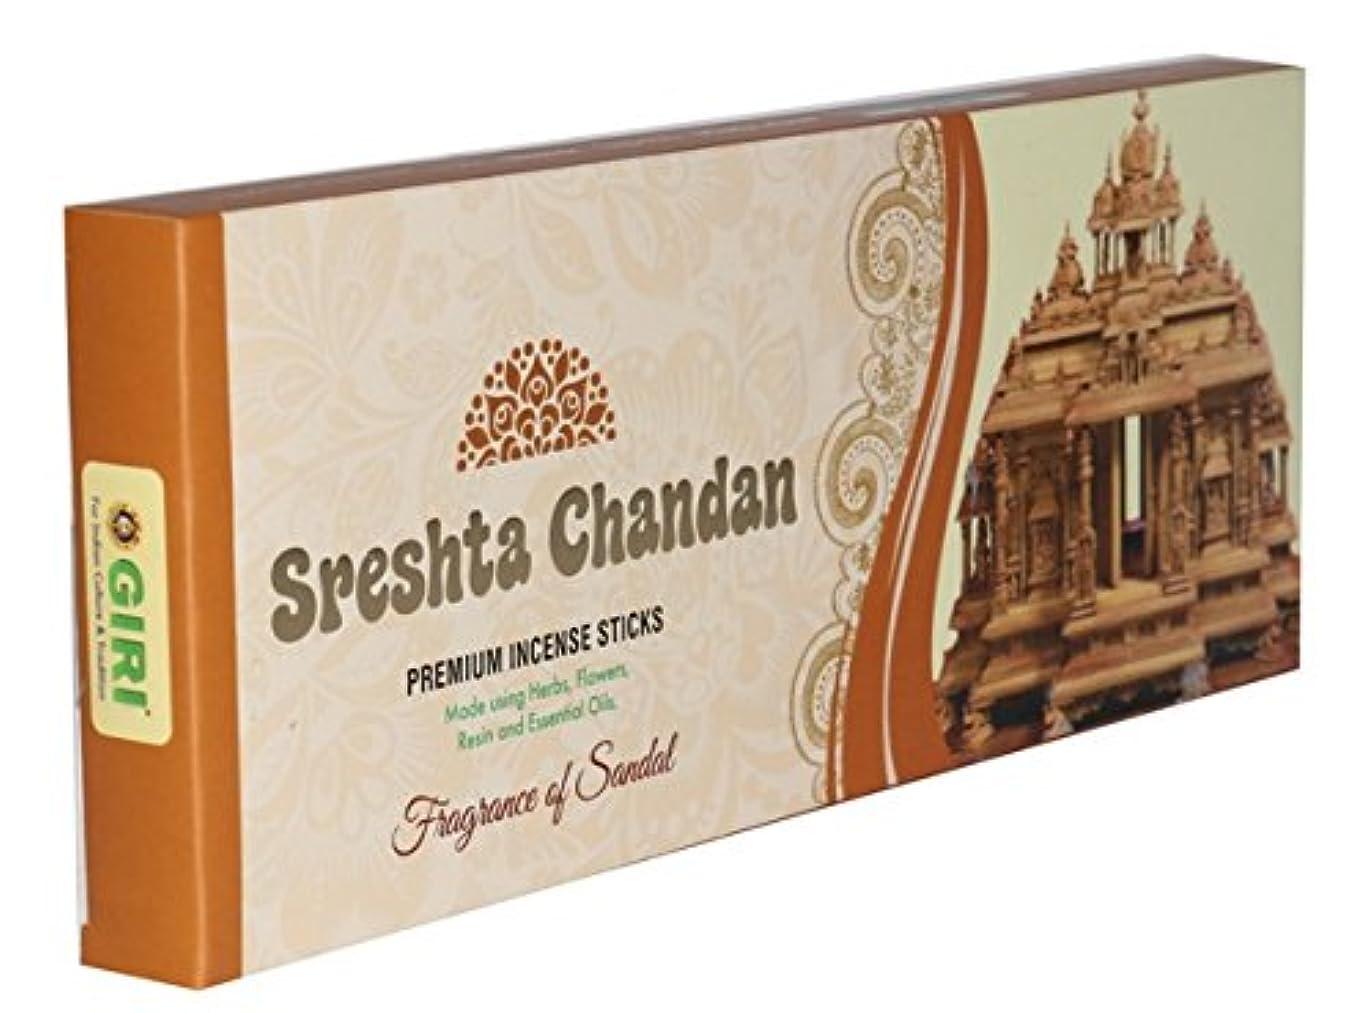 Giri Sreshta Chandan Flora 30本お香スティック